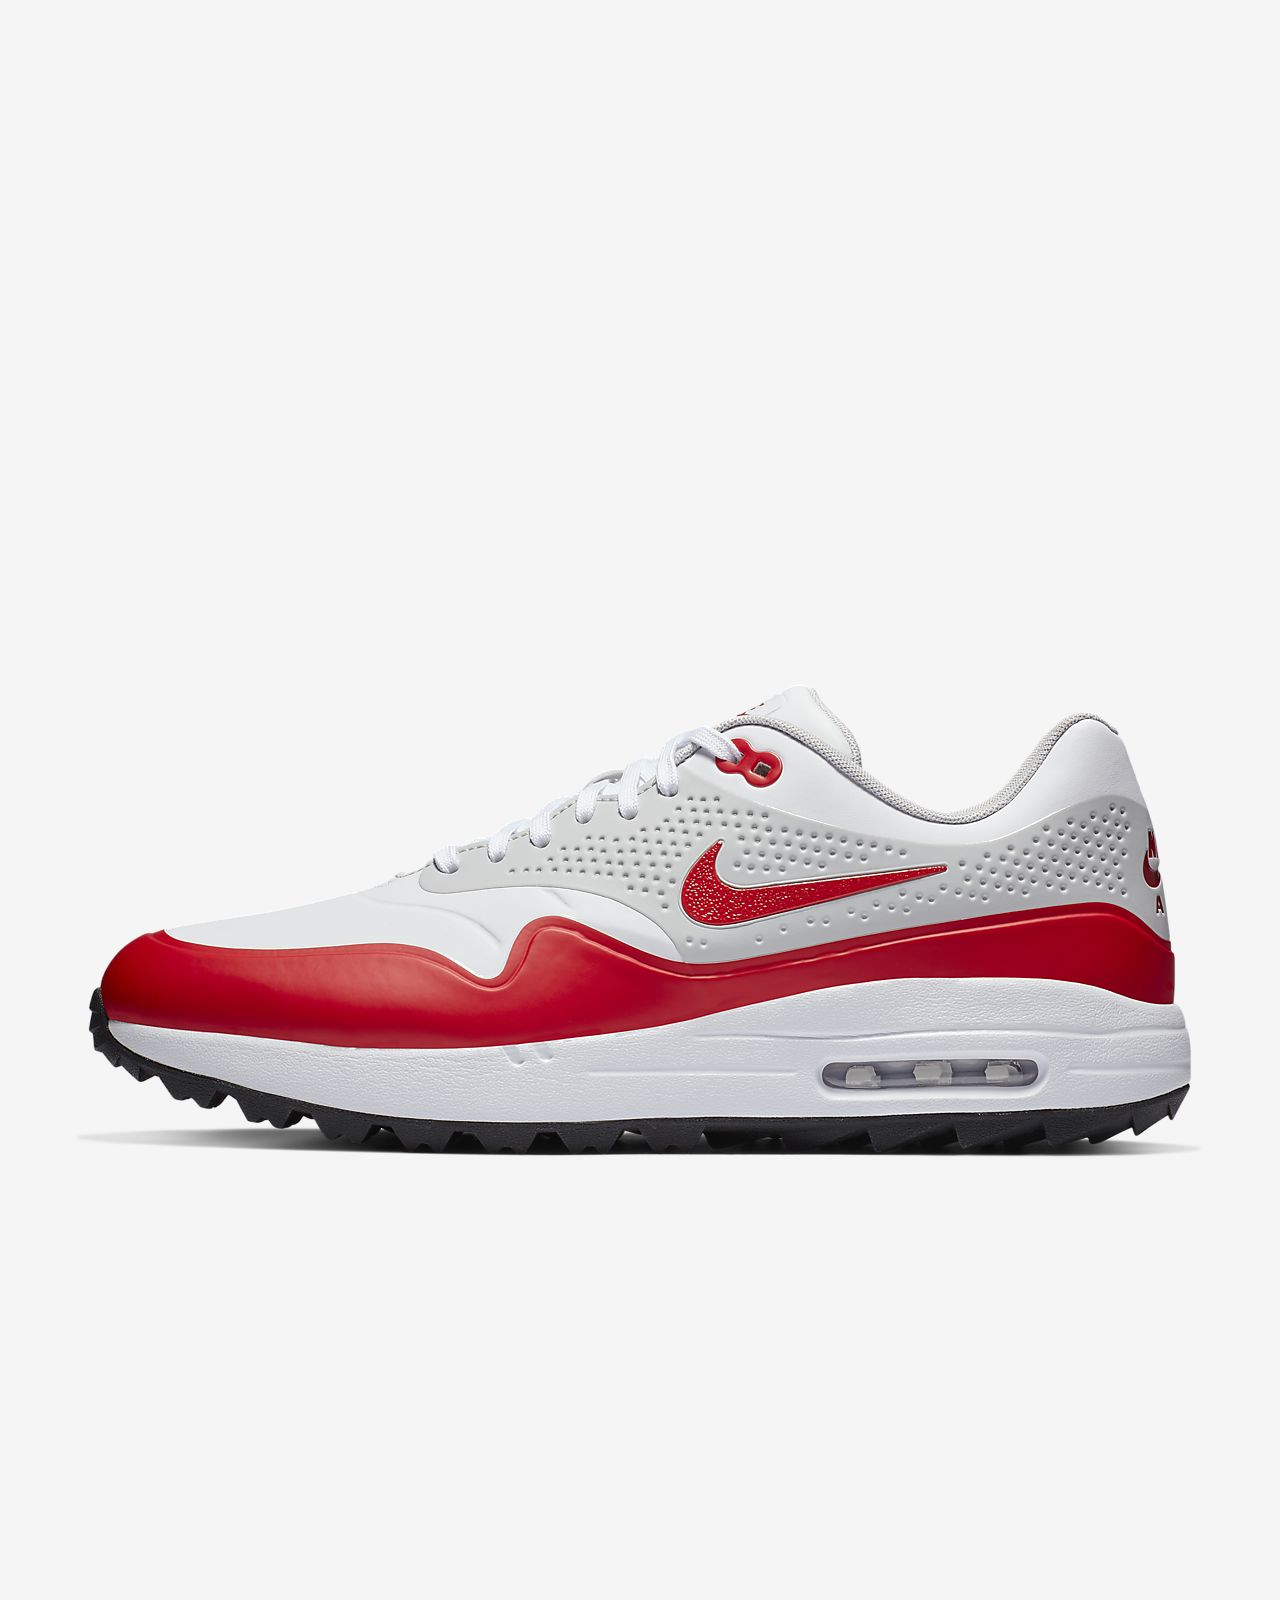 c15c5e18658 Pánská golfová bota Nike Air Max 1G. Nike.com CZ